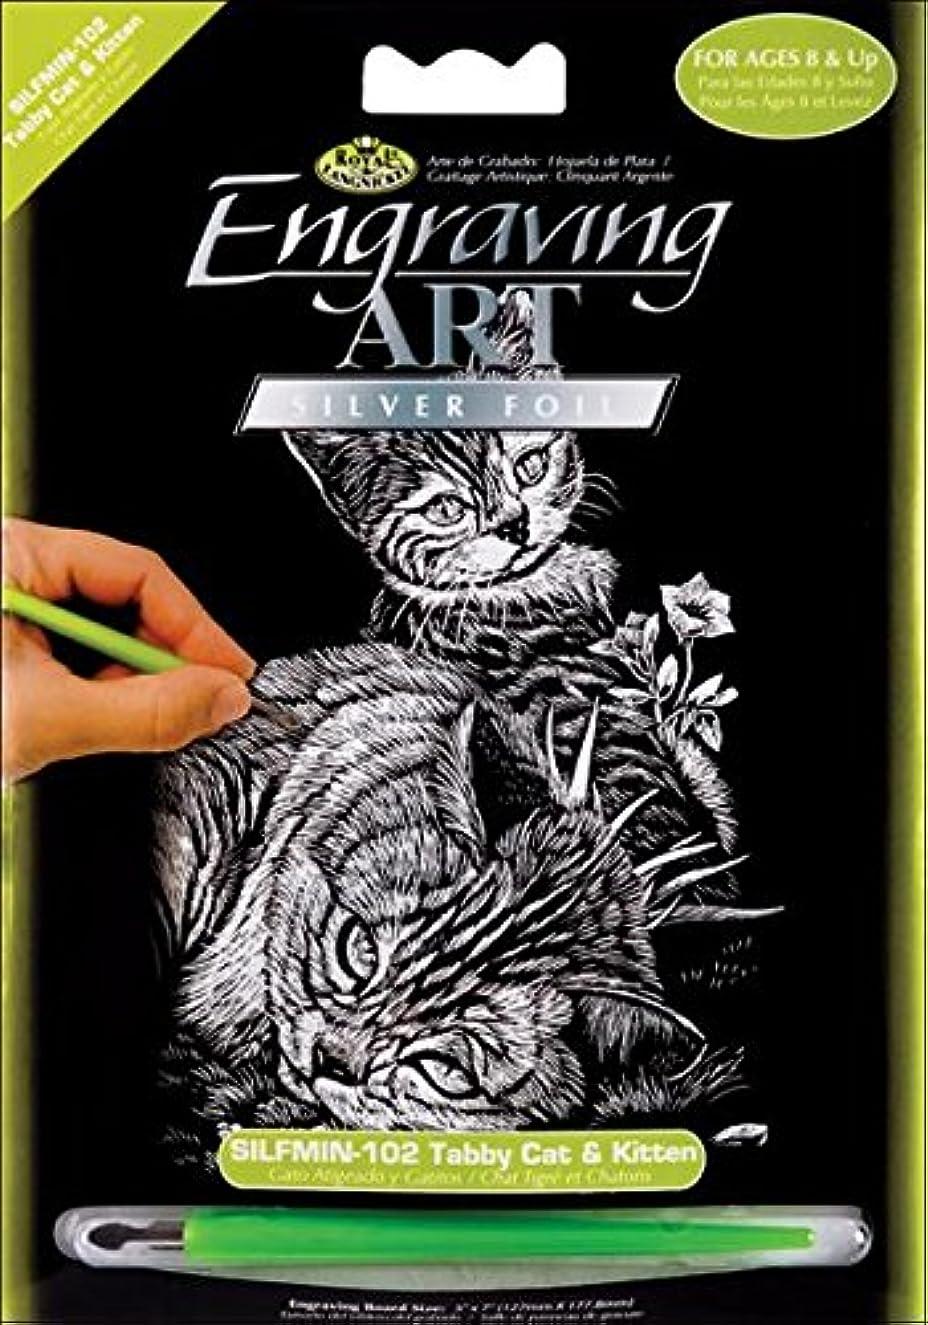 ROYAL BRUSH SILMIN-102 Tabby Cat and Kitten Mini Silver Foil Engraving Art Kit, 5 x 7